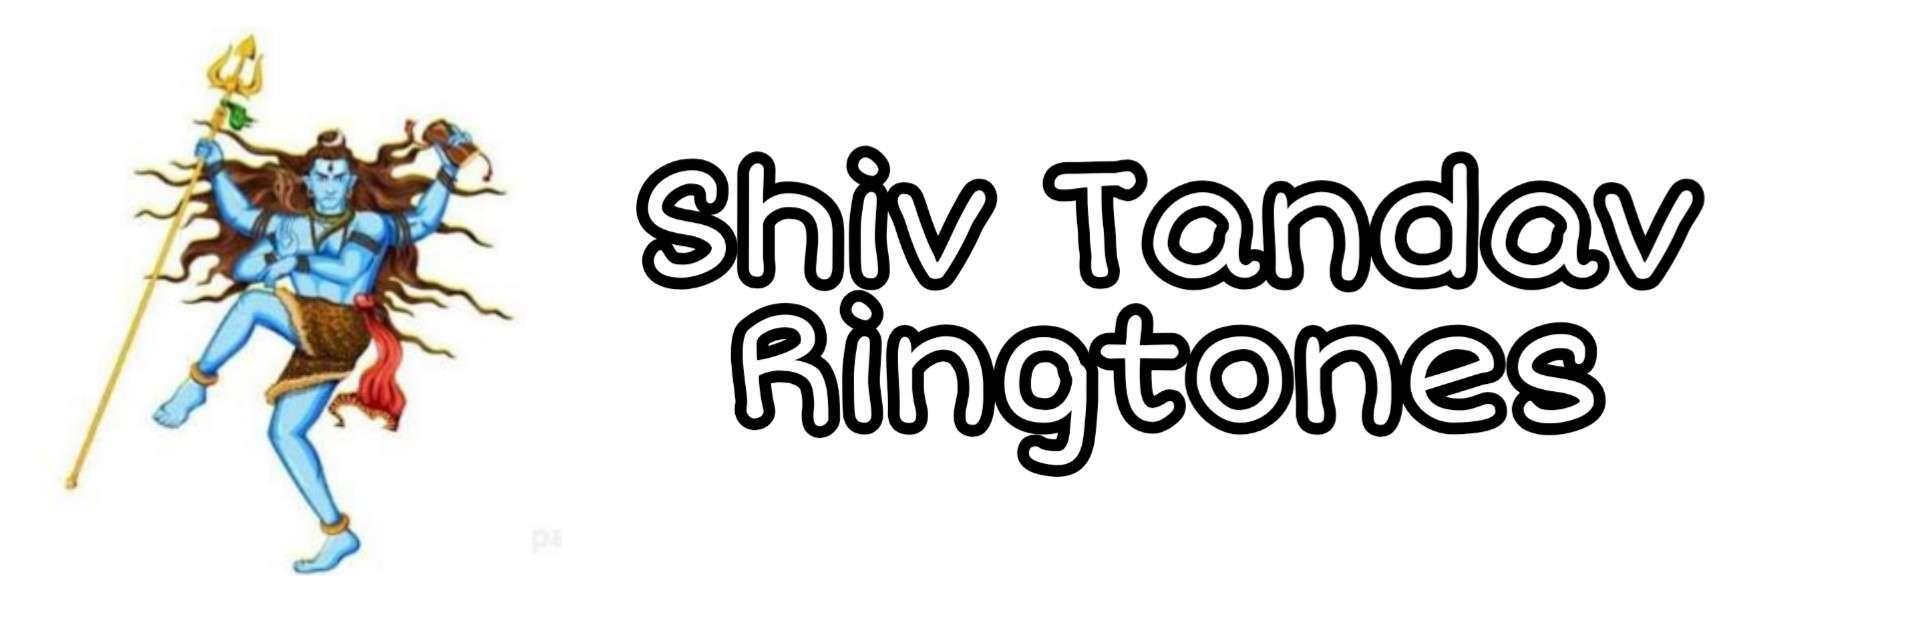 shiv tandav ringtone download